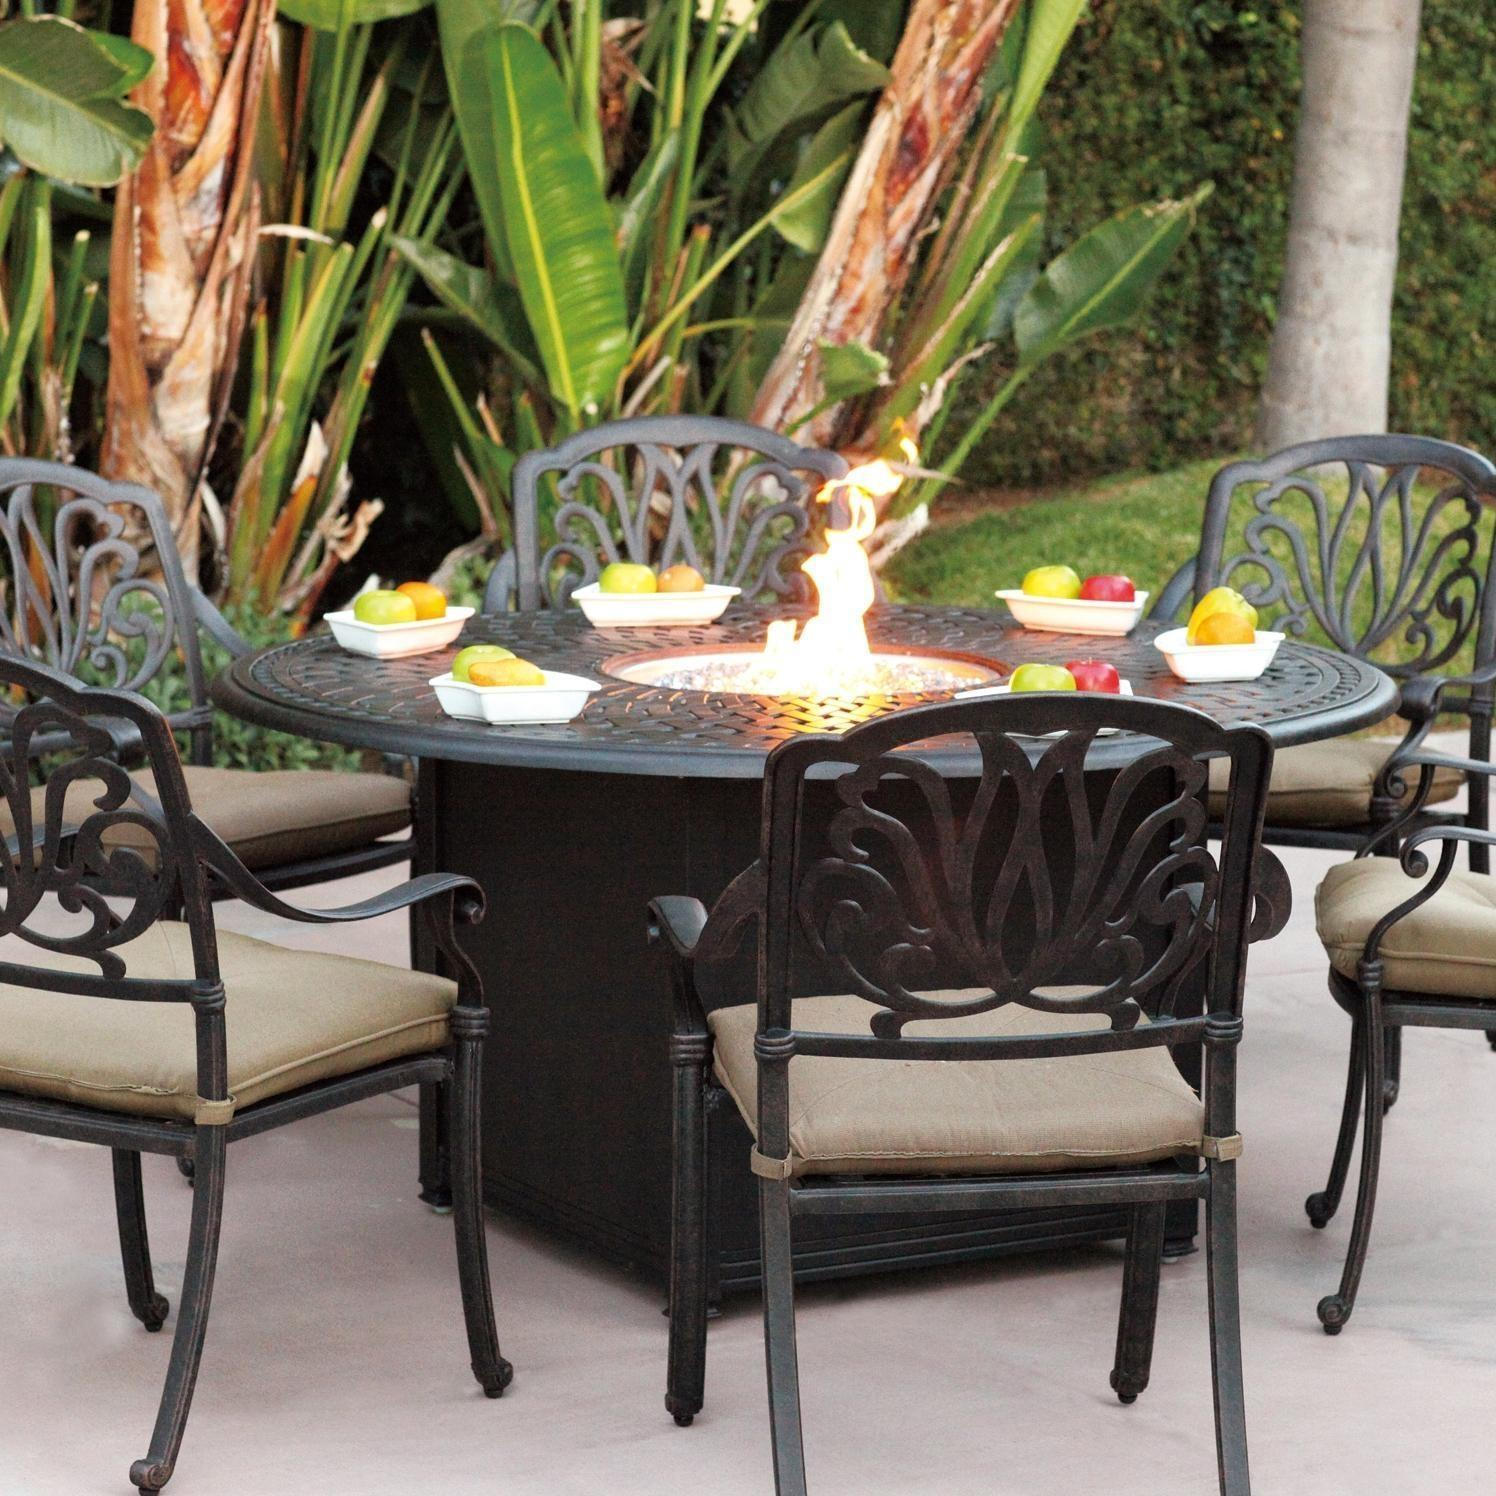 Darlee Elisabeth 7 Piece Cast Aluminum Patio Fire Pit Dining Set